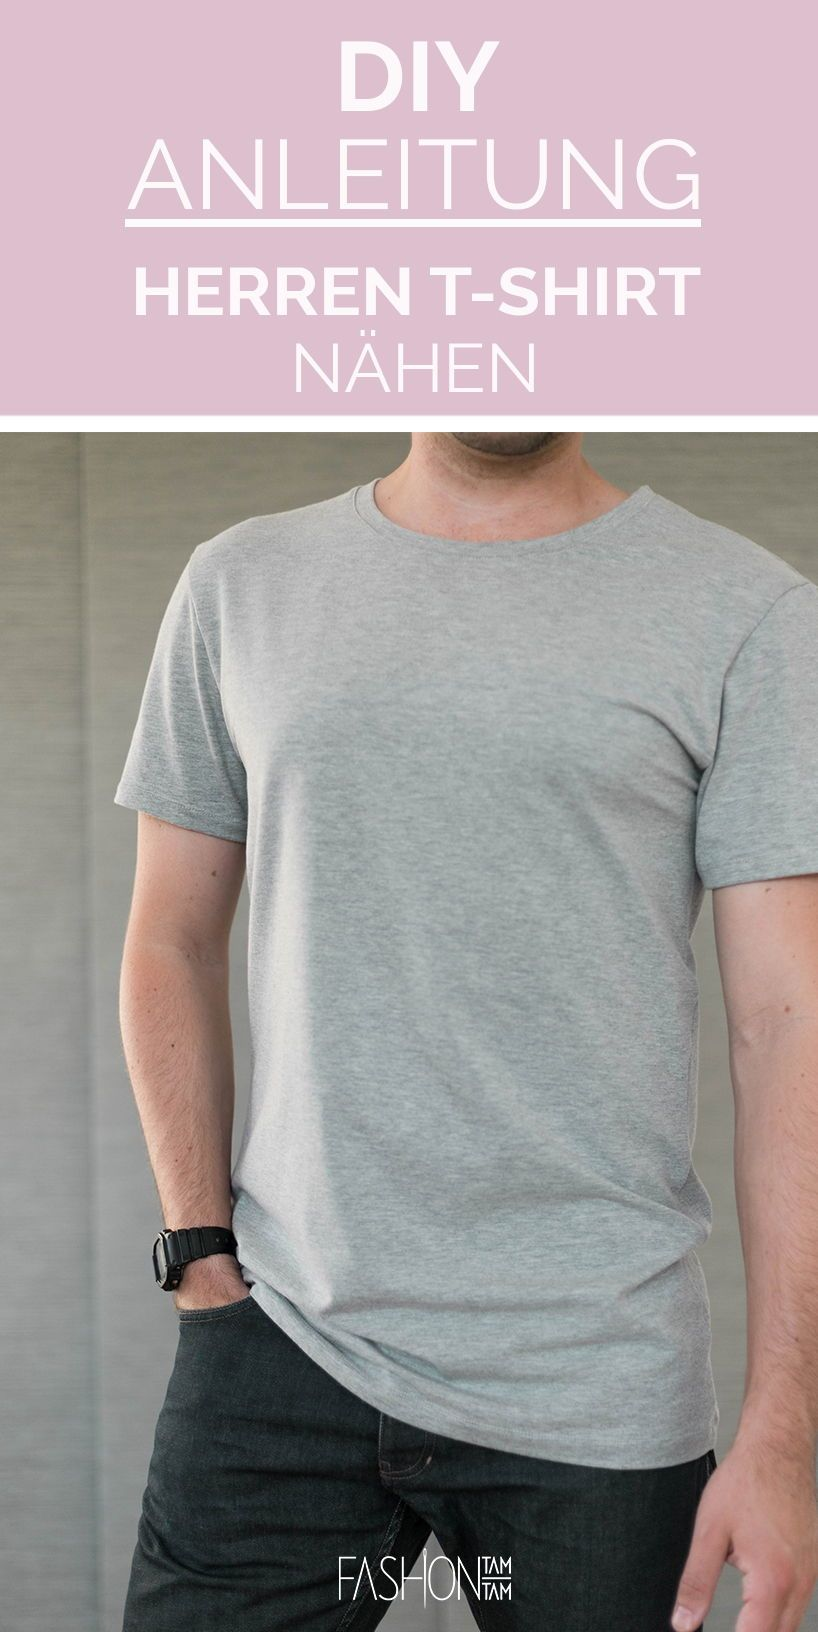 Schnittmuster T-Shirt #menswag für Herren Download